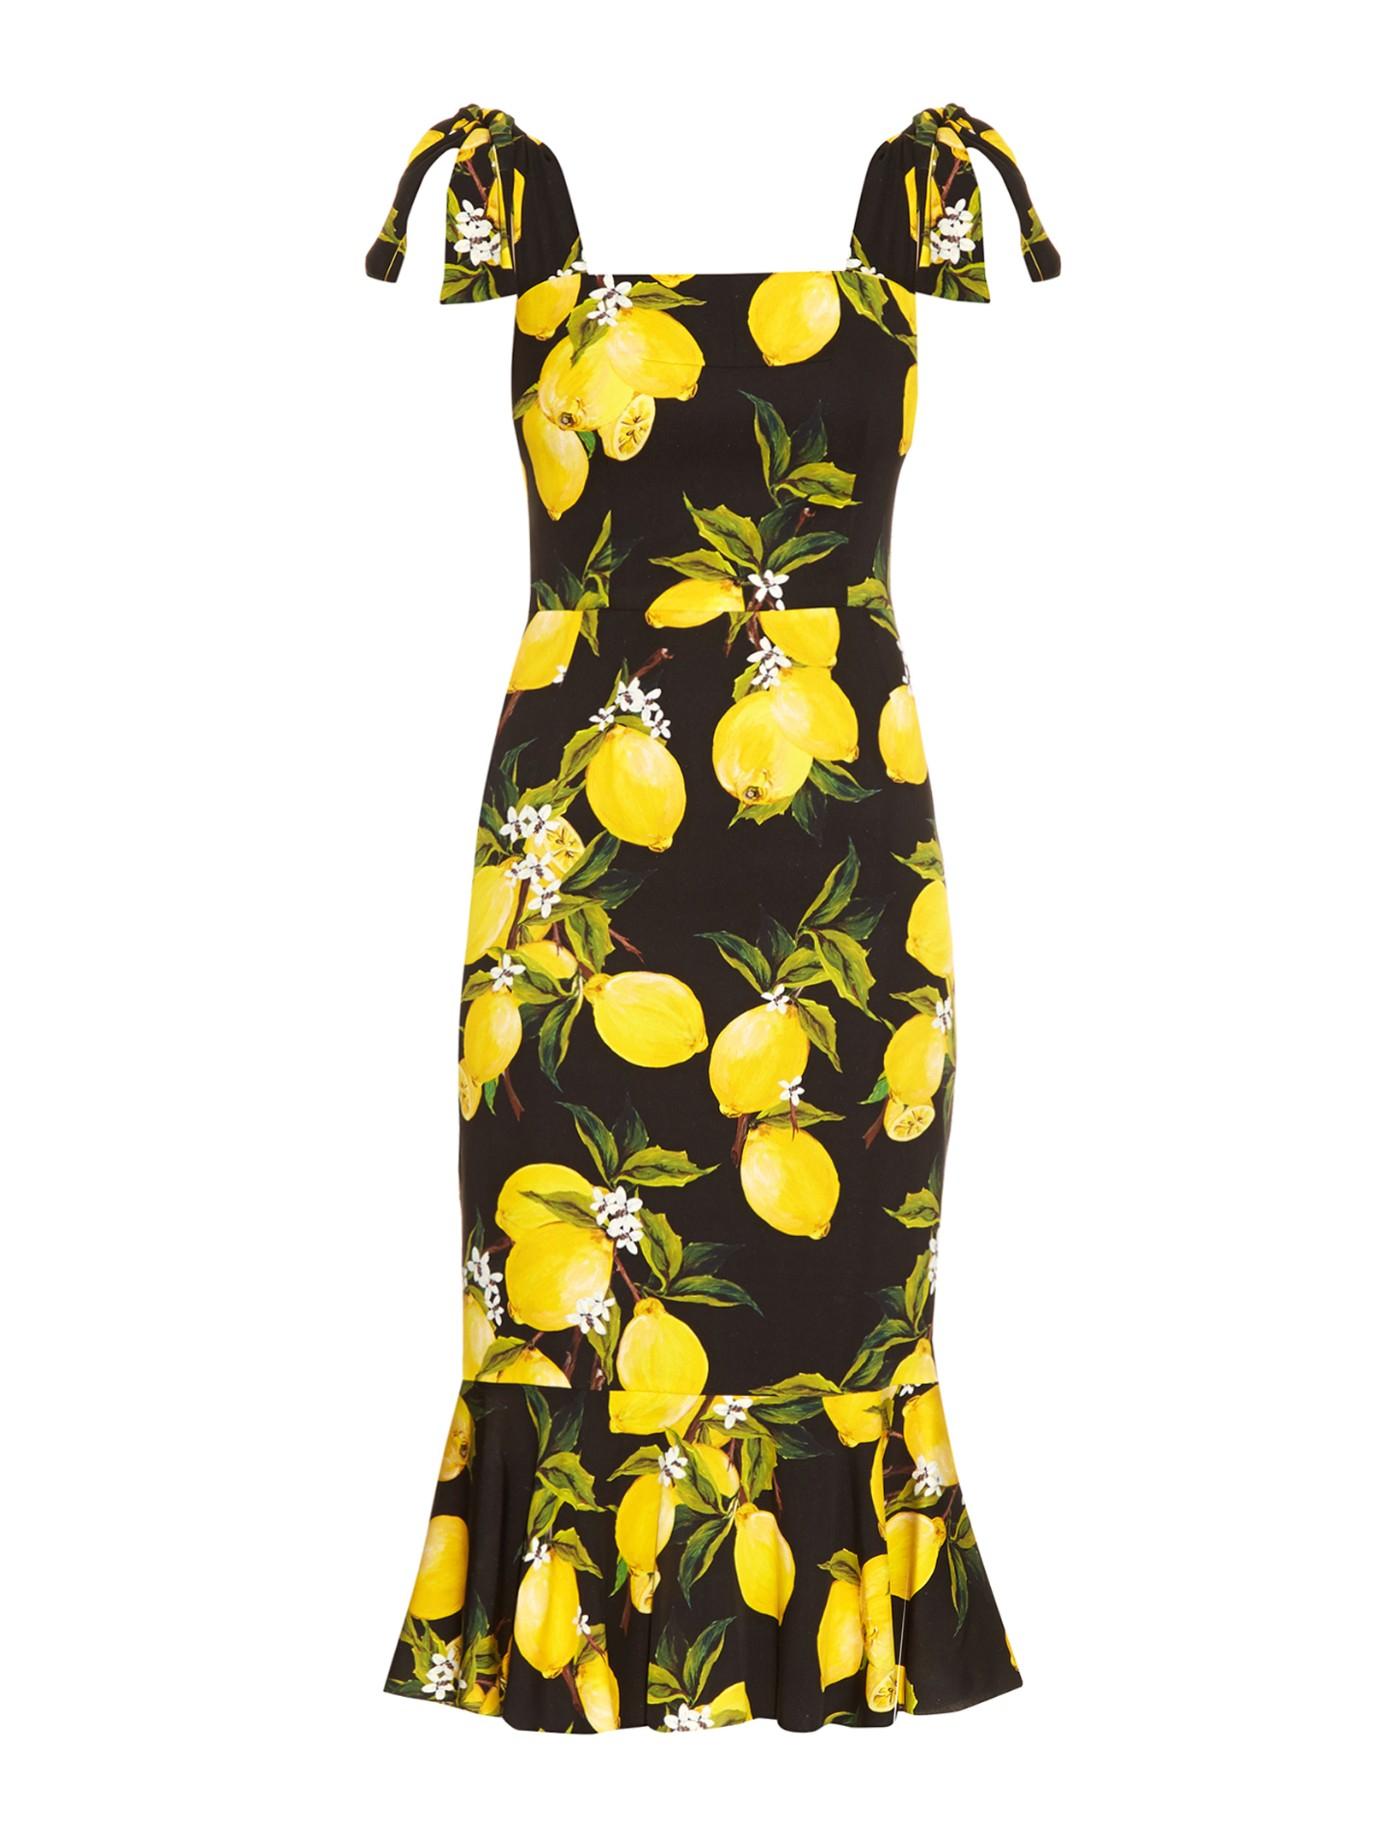 fd8981358a94 Dolce & Gabbana Lemon-print Fluted-hem Straps Dress in Yellow - Lyst